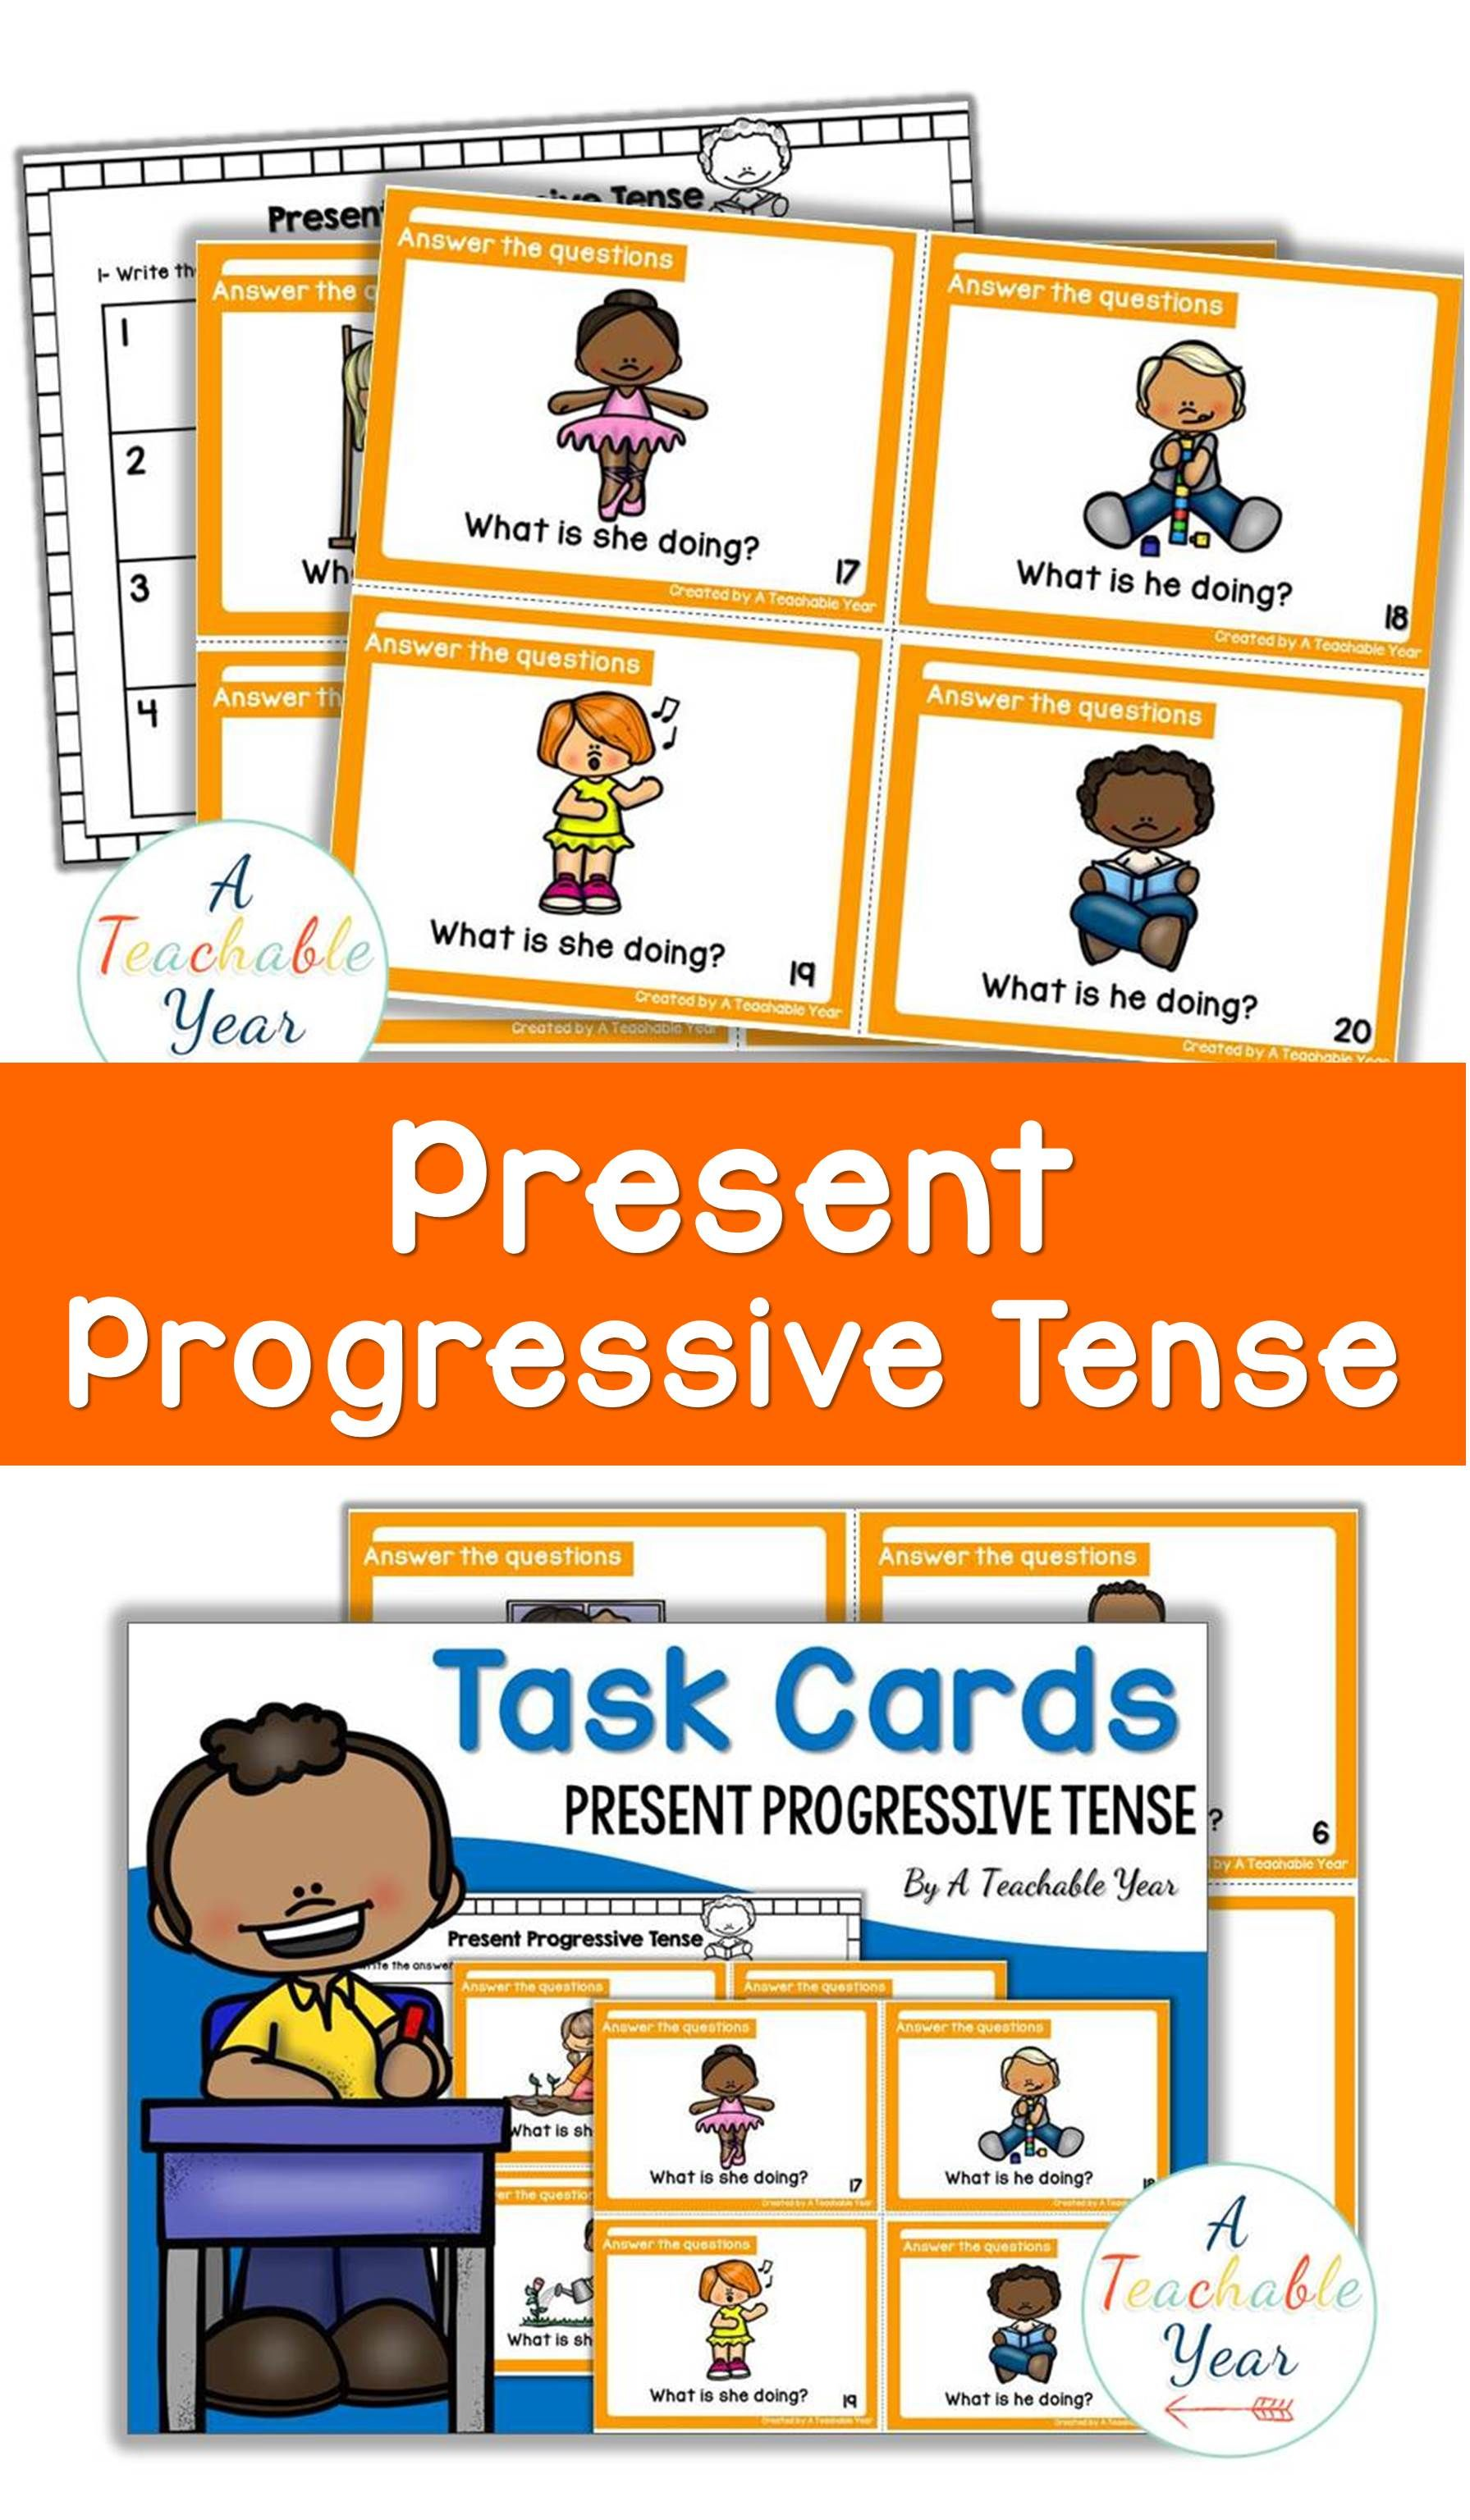 Task Cards Present Progressive Tense En Con Imagenes